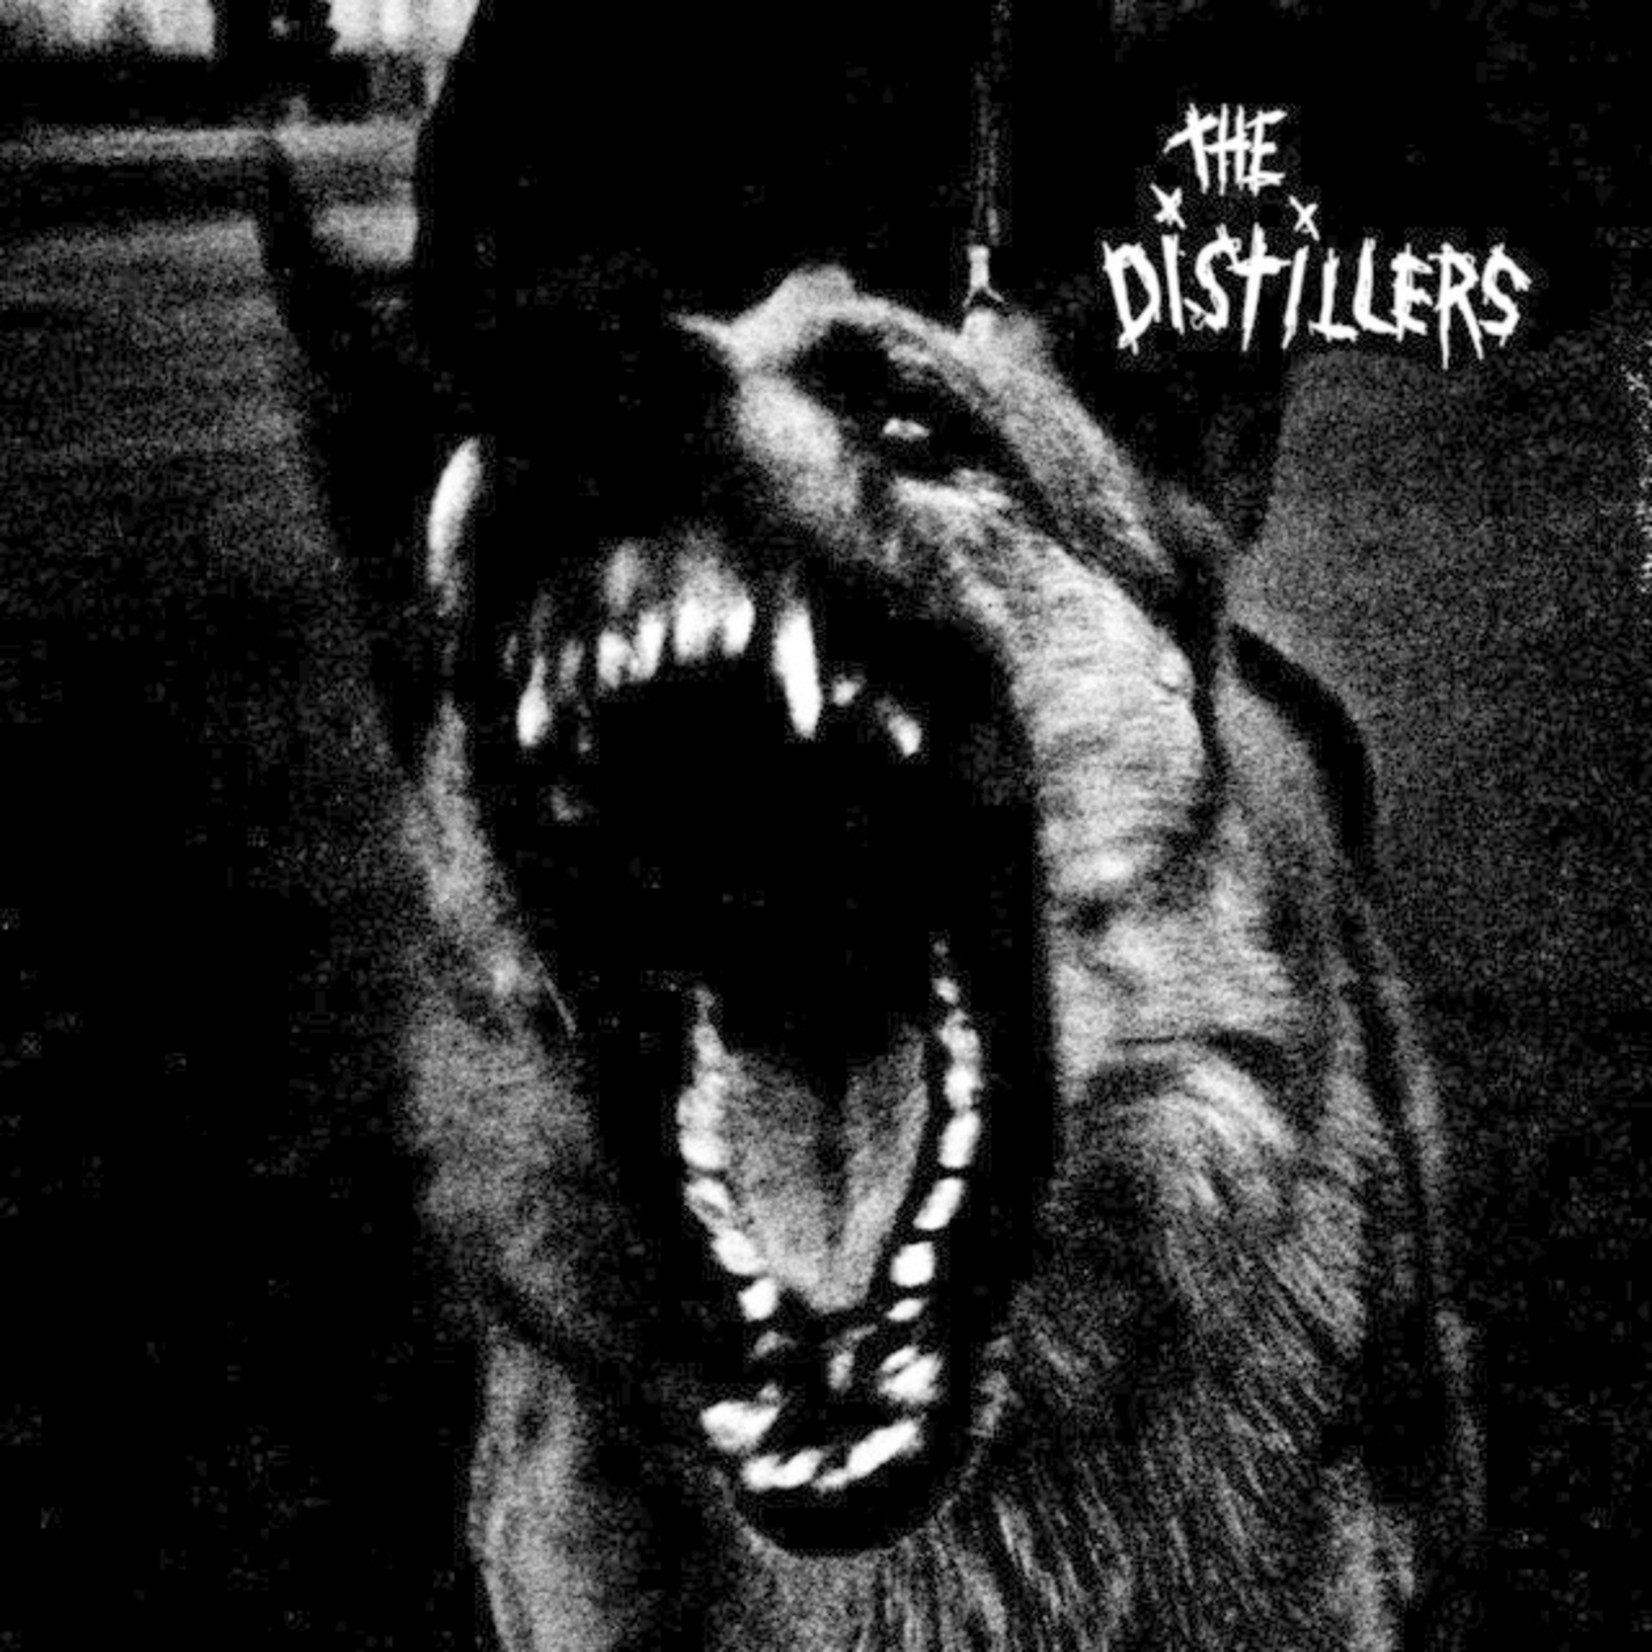 Vinyl The Distillers - S/T (Import)